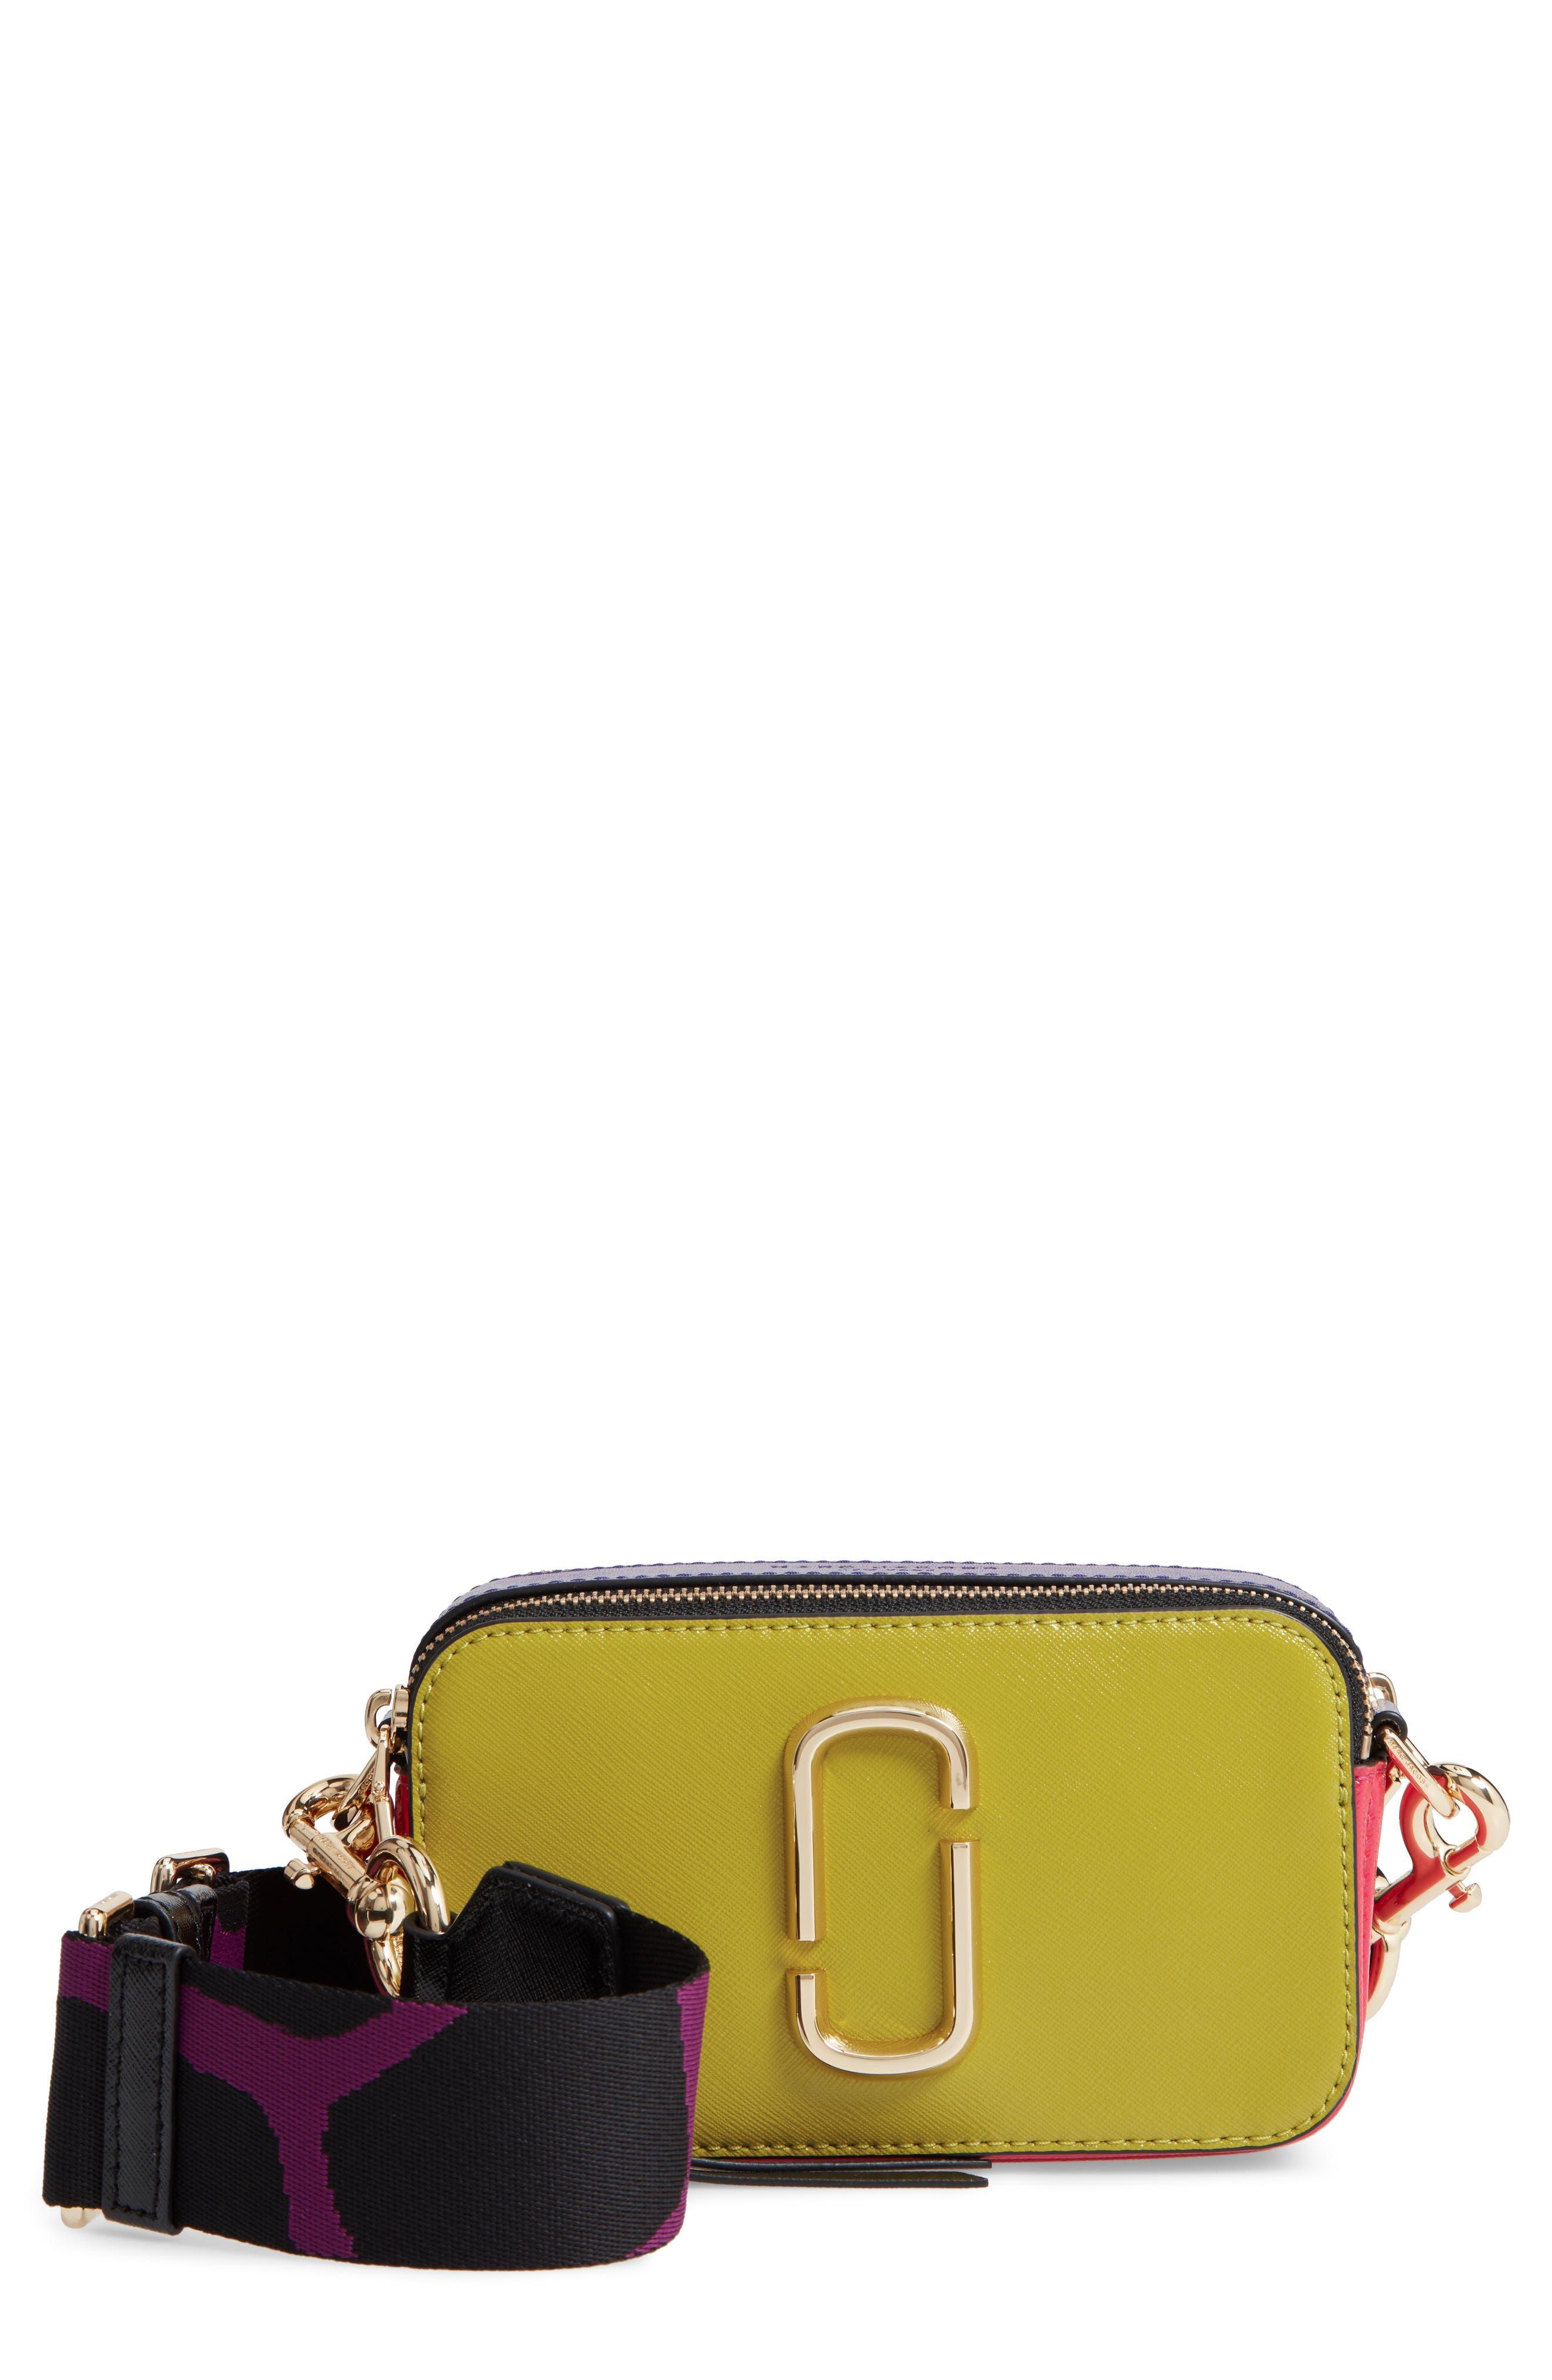 Snapshot Crossbody Bag,                             Main thumbnail 1, color,                             Chartreuse Multi